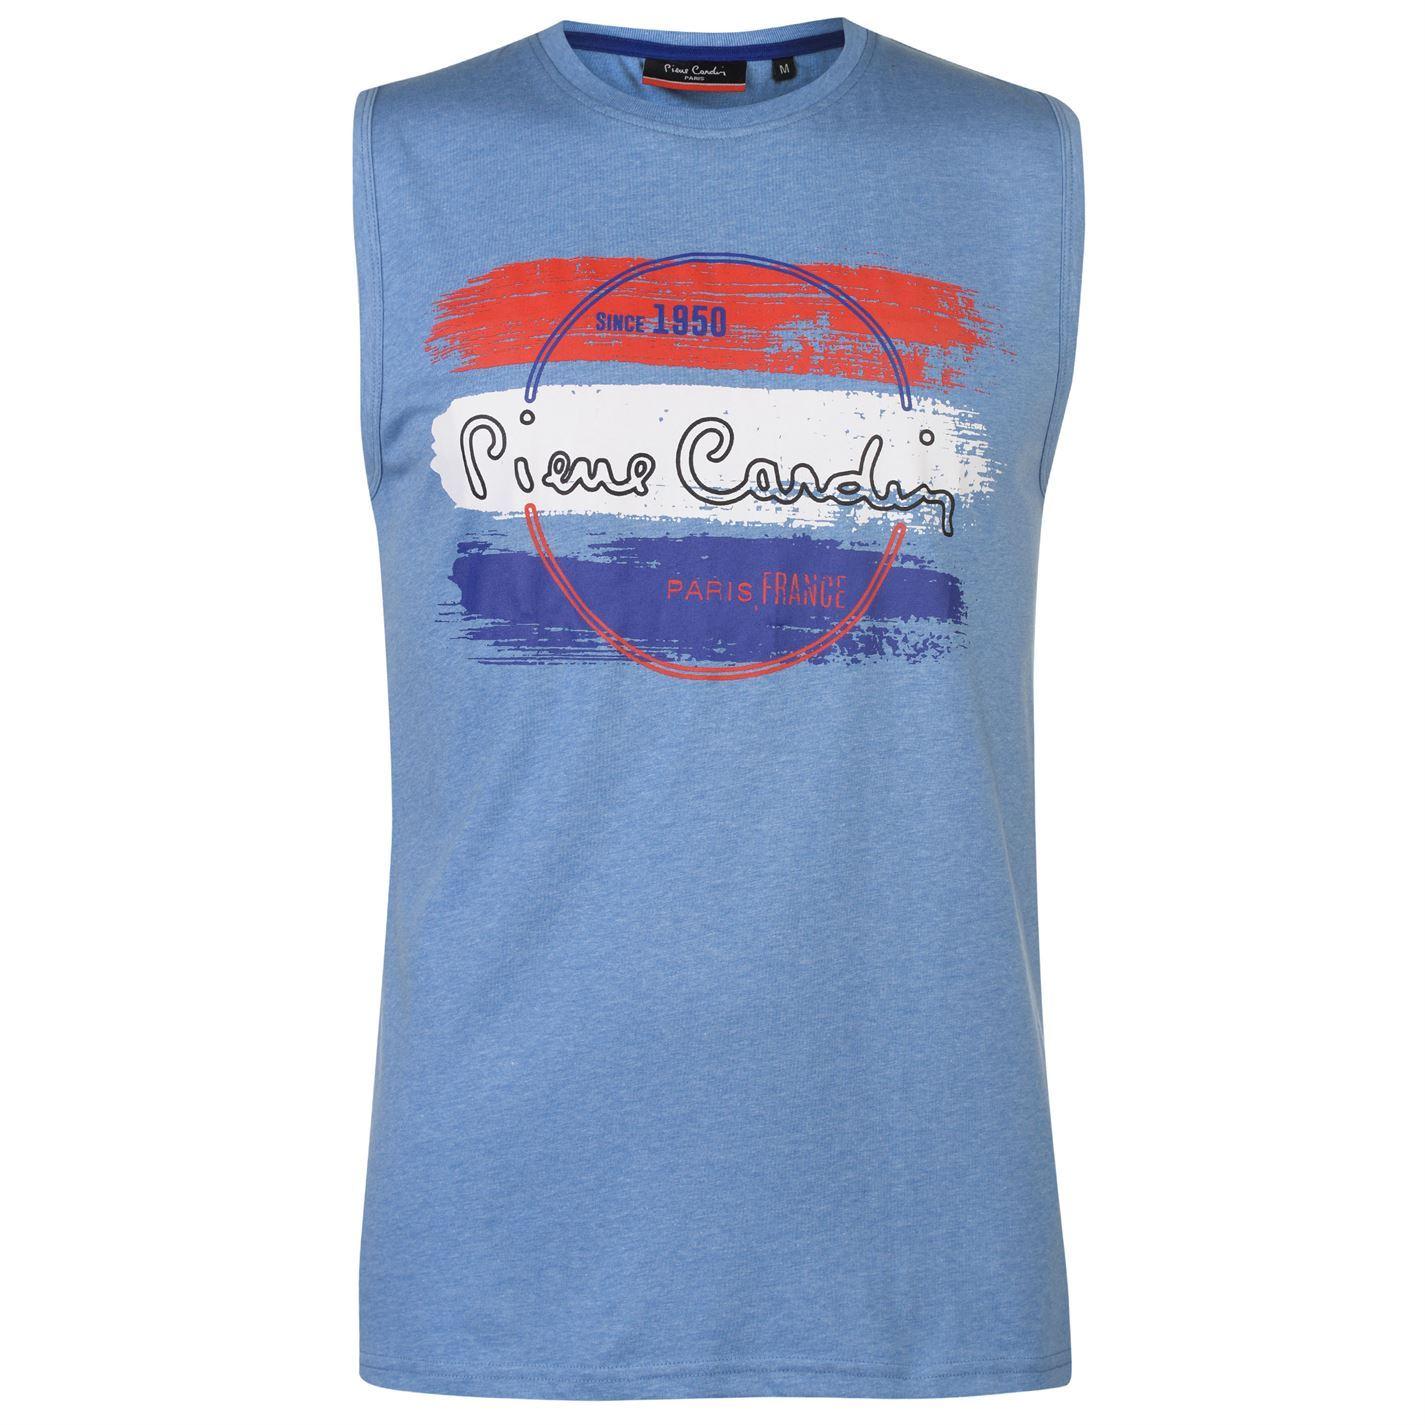 Pierre-Cardin-Mens-Graphic-Sleeveless-T-Shirt-Tee-Top-Round-Neck-Lightweight